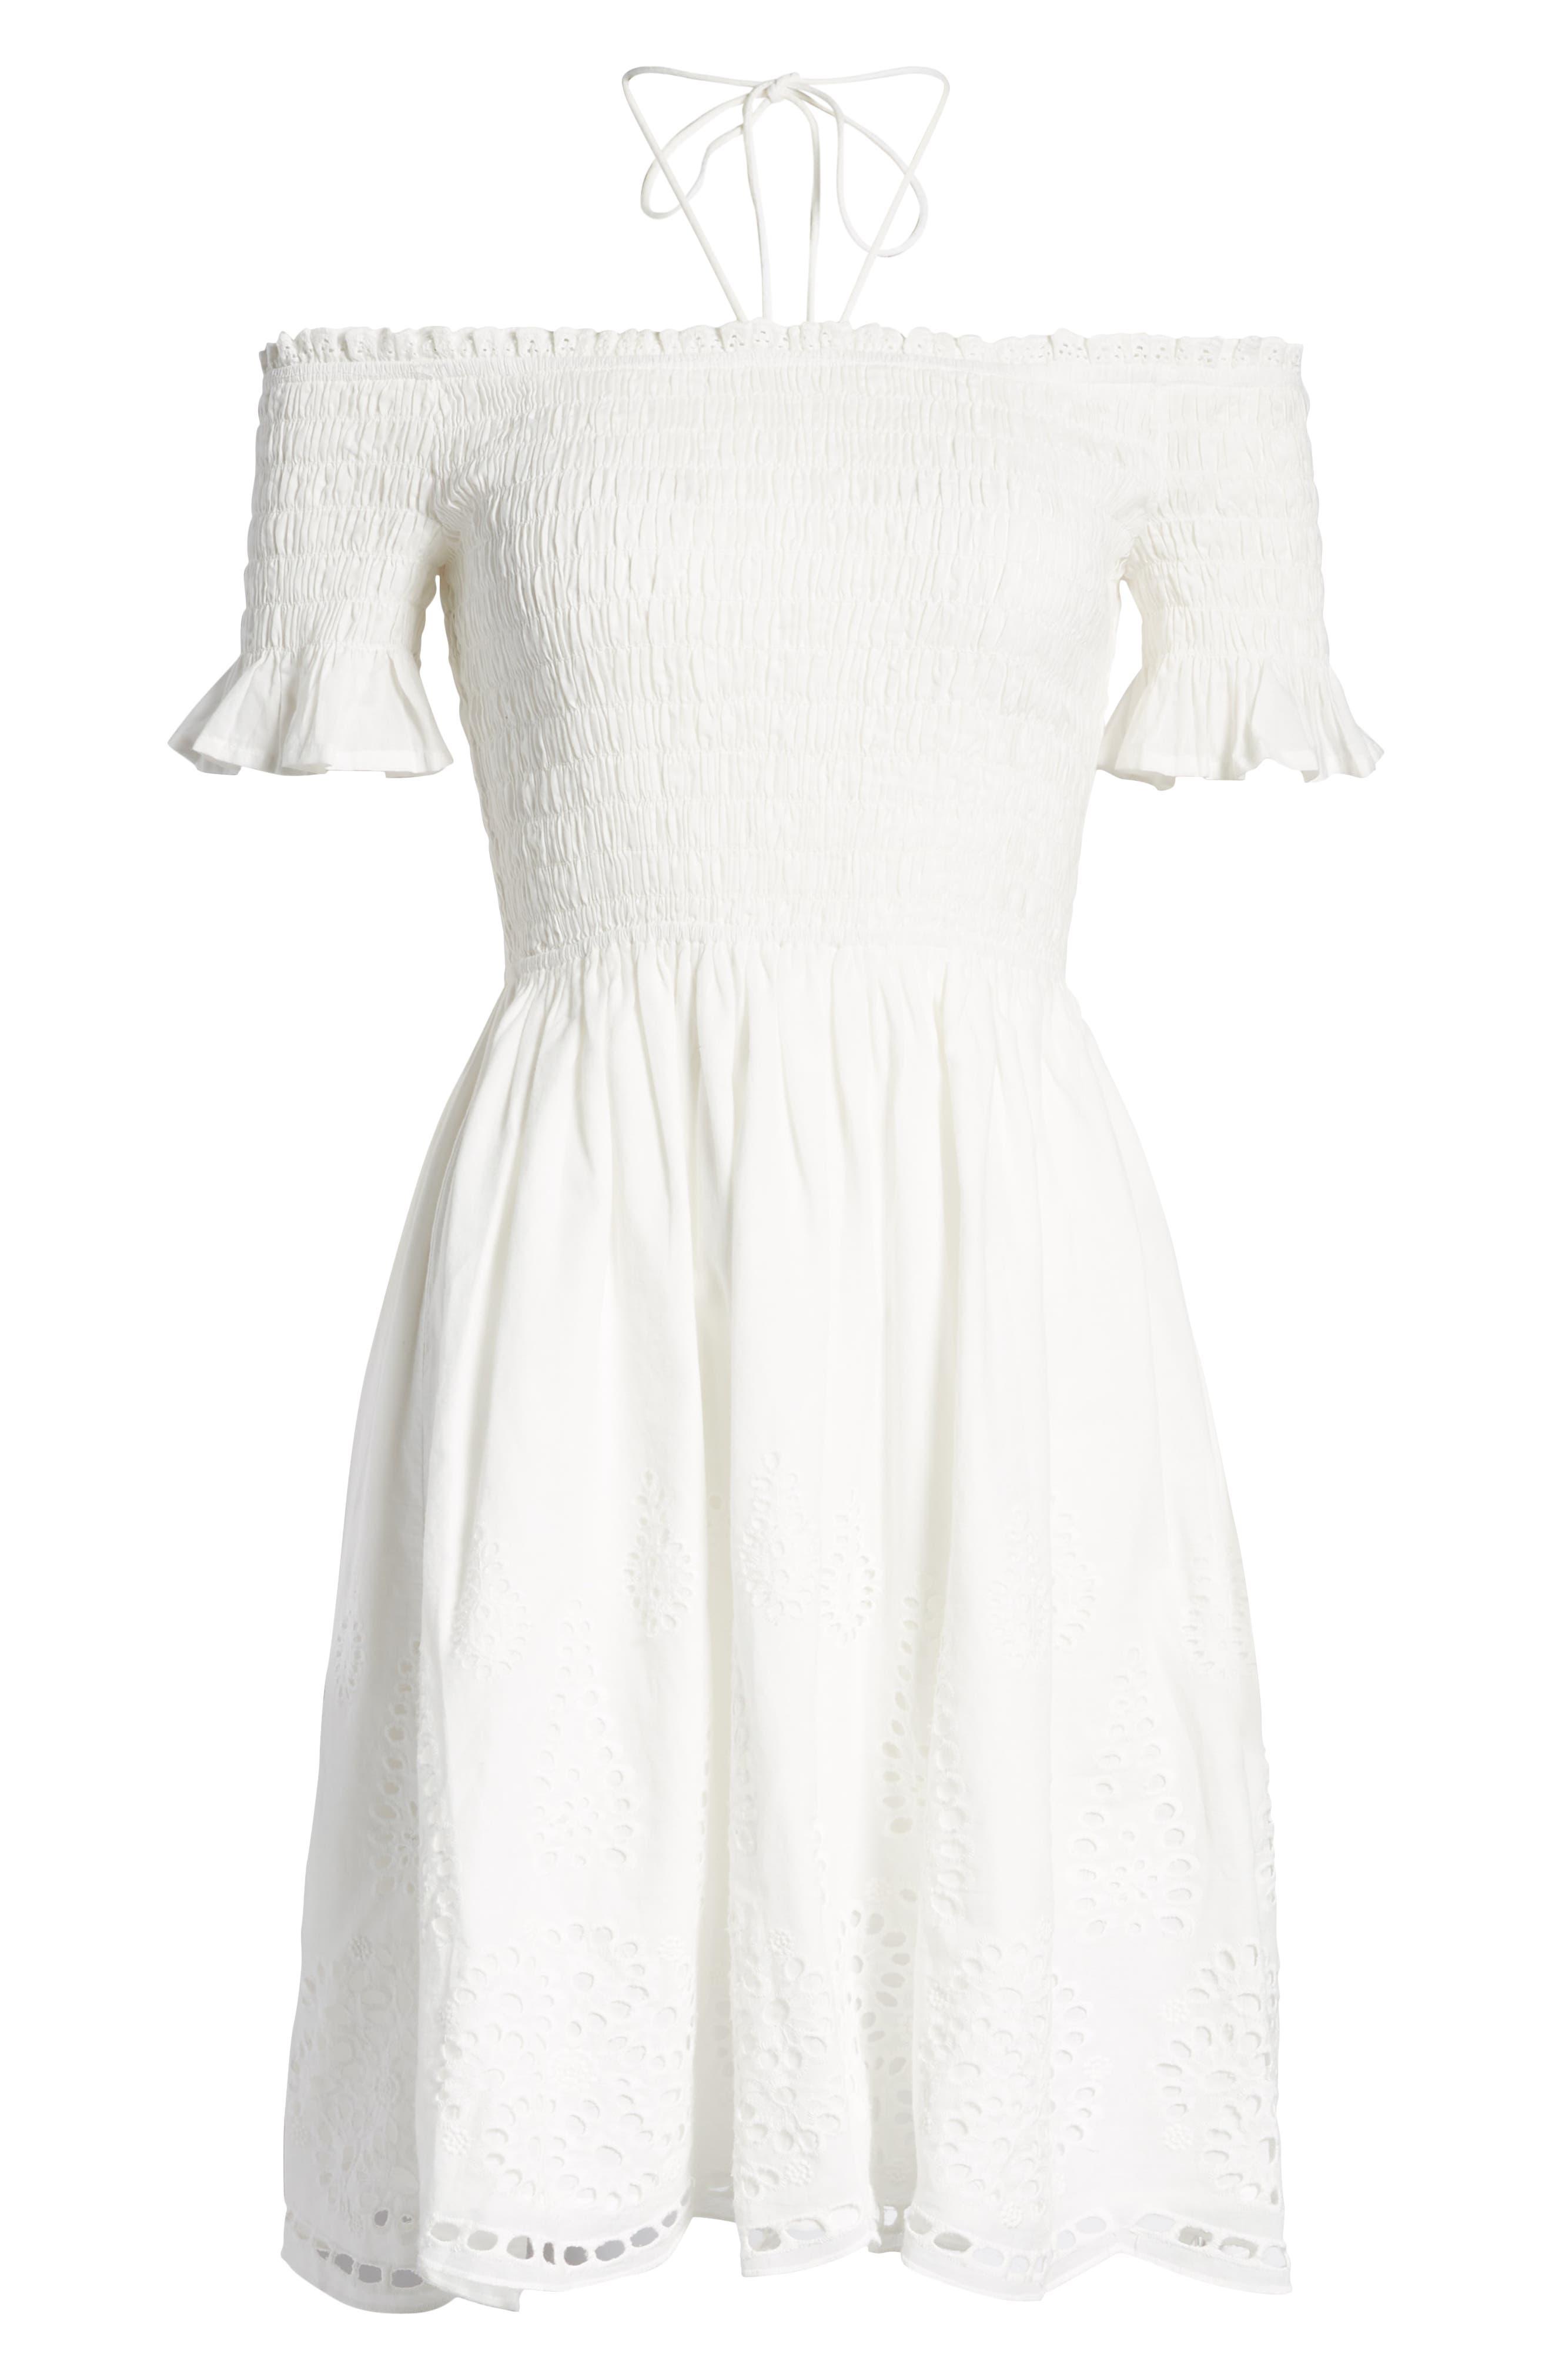 Smocked Off the Shoulder Dress,                             Alternate thumbnail 7, color,                             WHITE EYELET